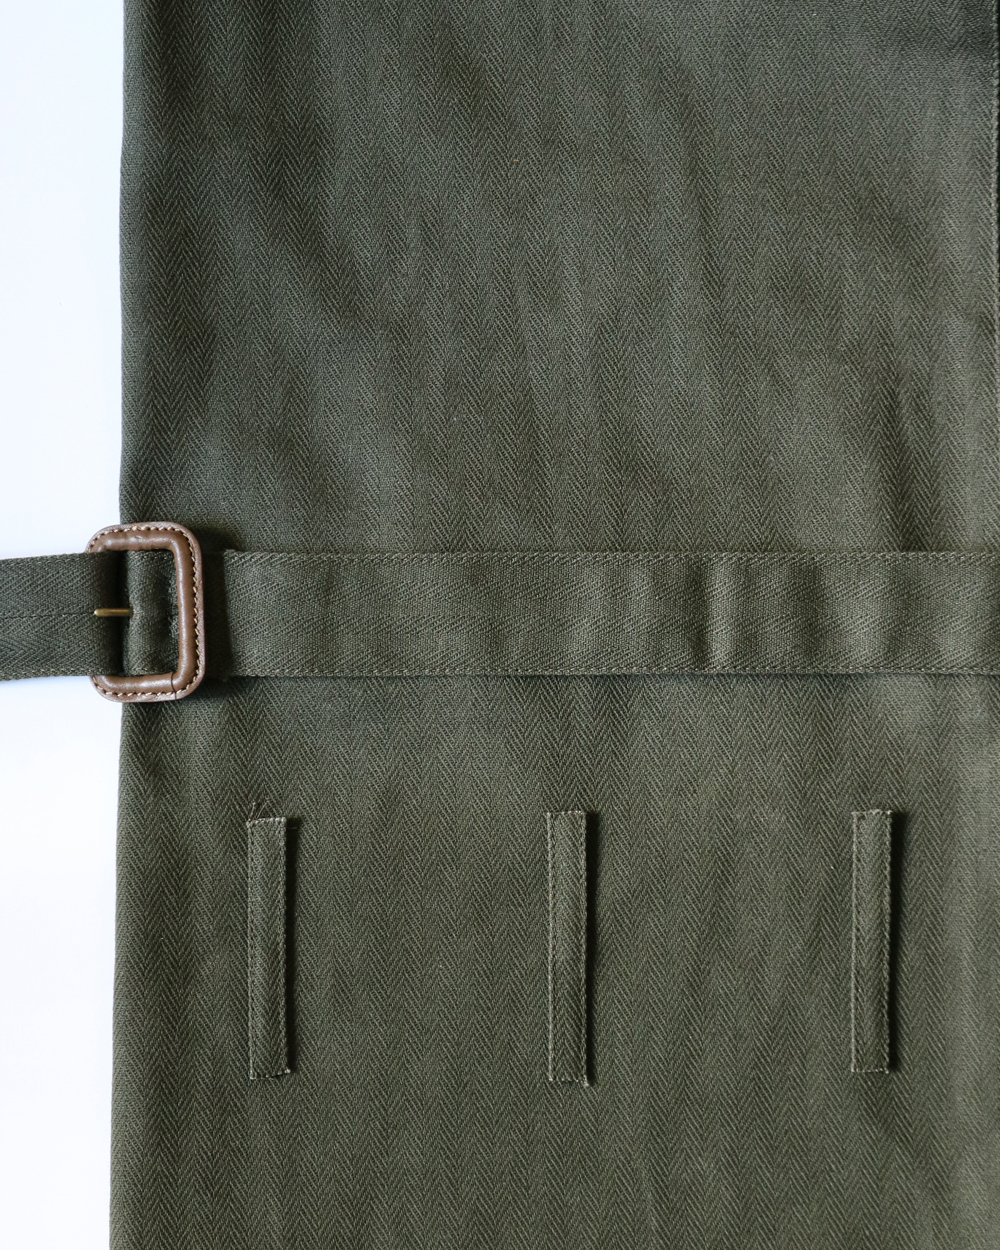 Herringbone JUMPSUIT - Olive Exclusive NEAT